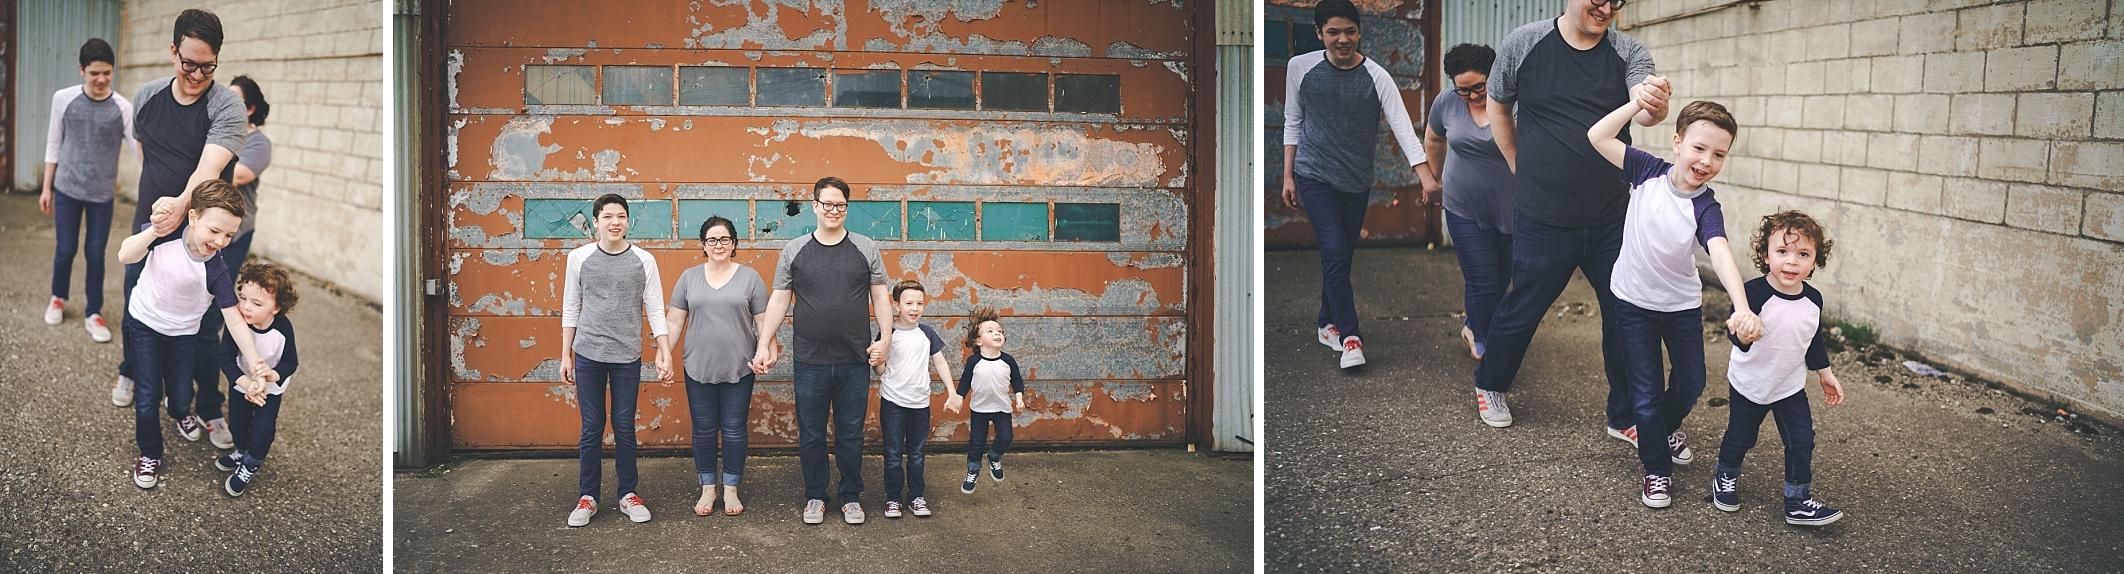 0022_young-family-children-photography-dayton.jpg